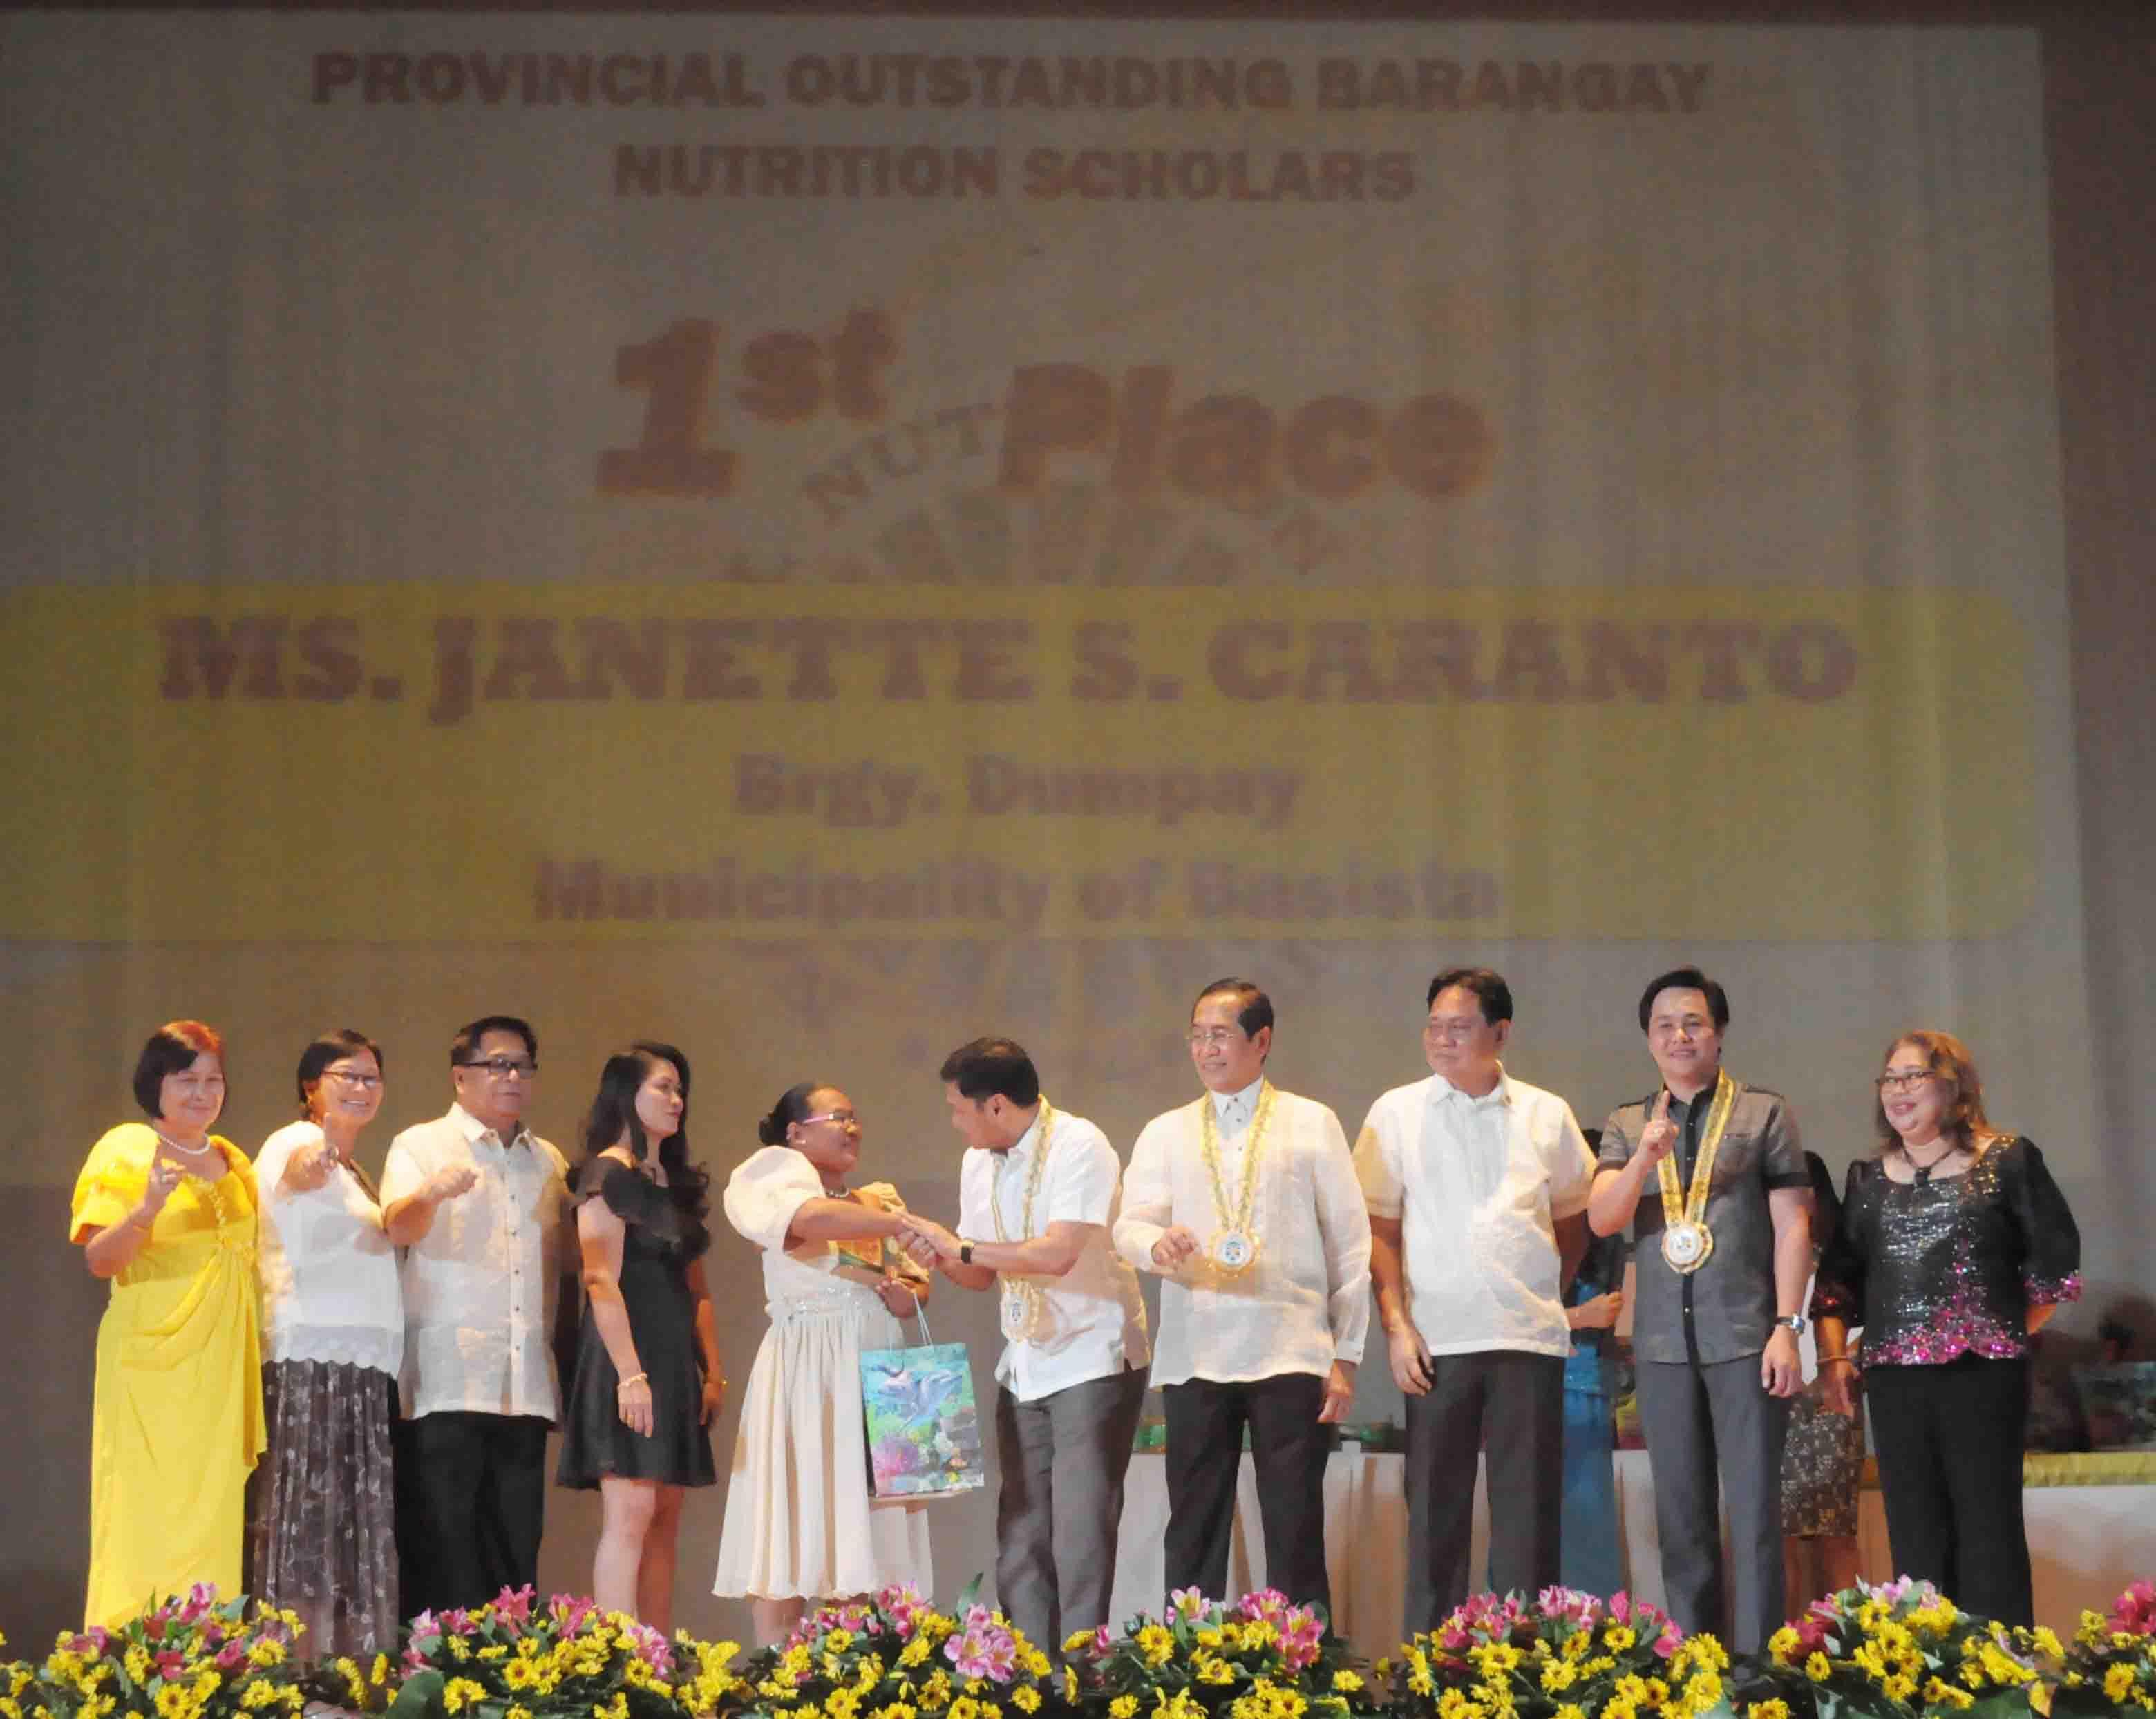 outstanding barangay nutrition scholars